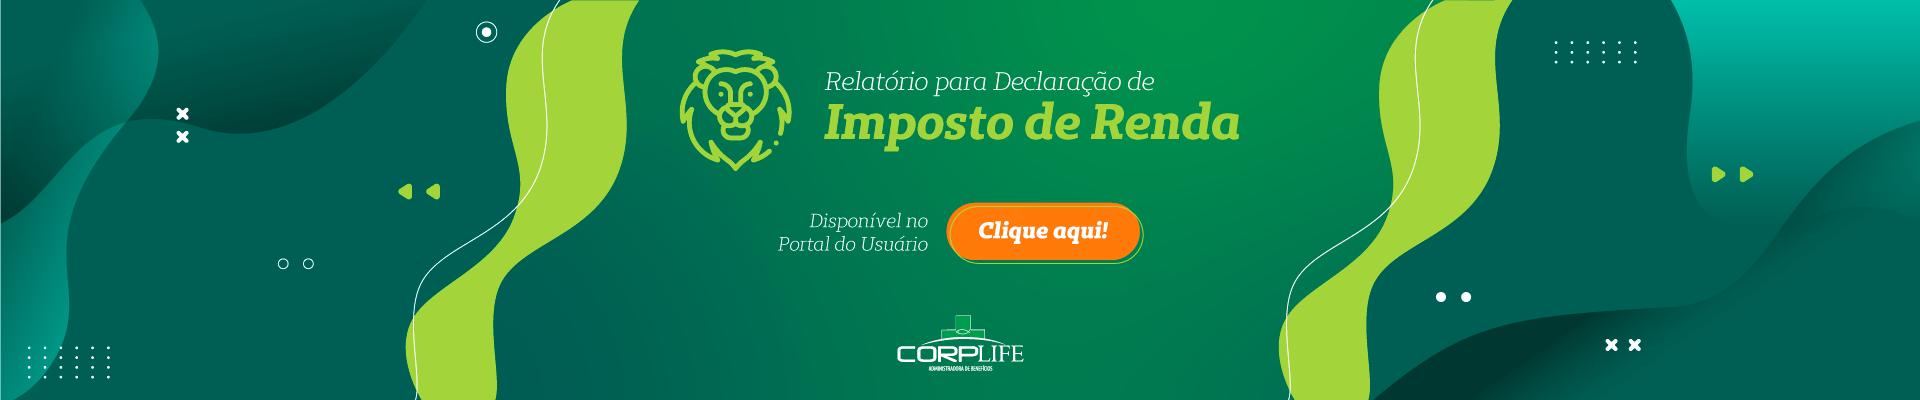 Banner-site-Imposto-de-Renda